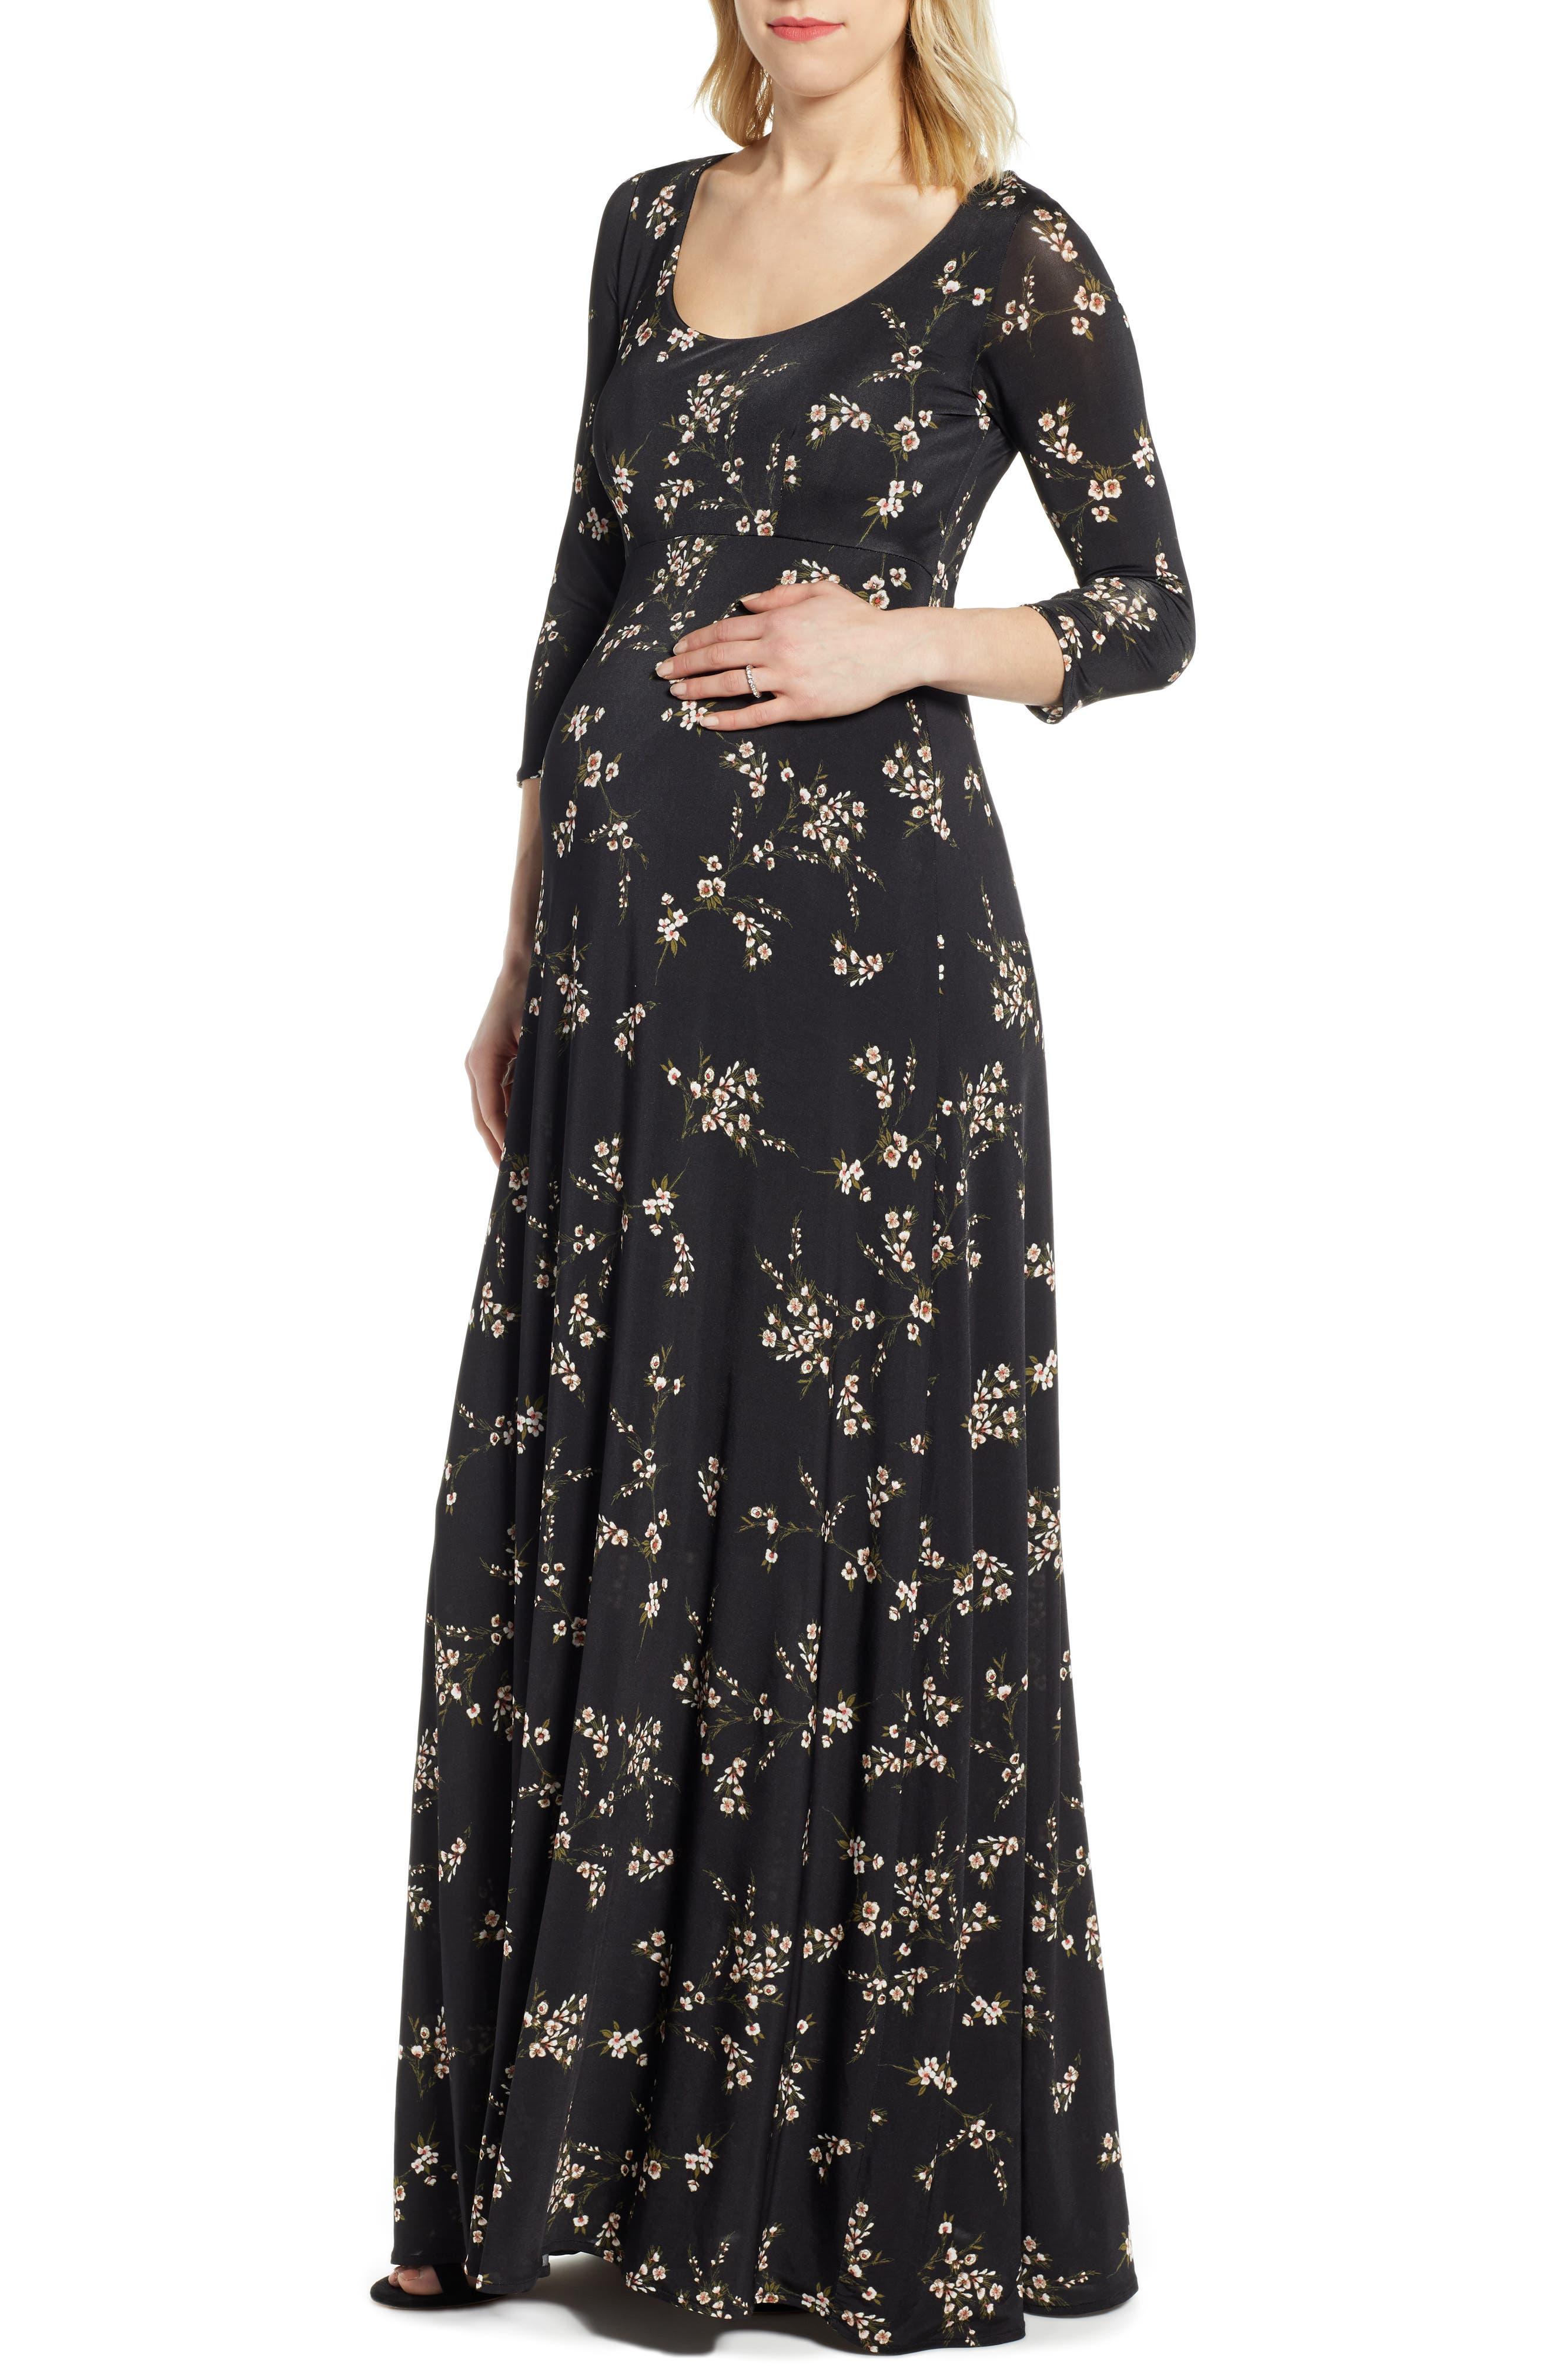 Tiffany Rose Samantha Maternity Maxi Dress, Black